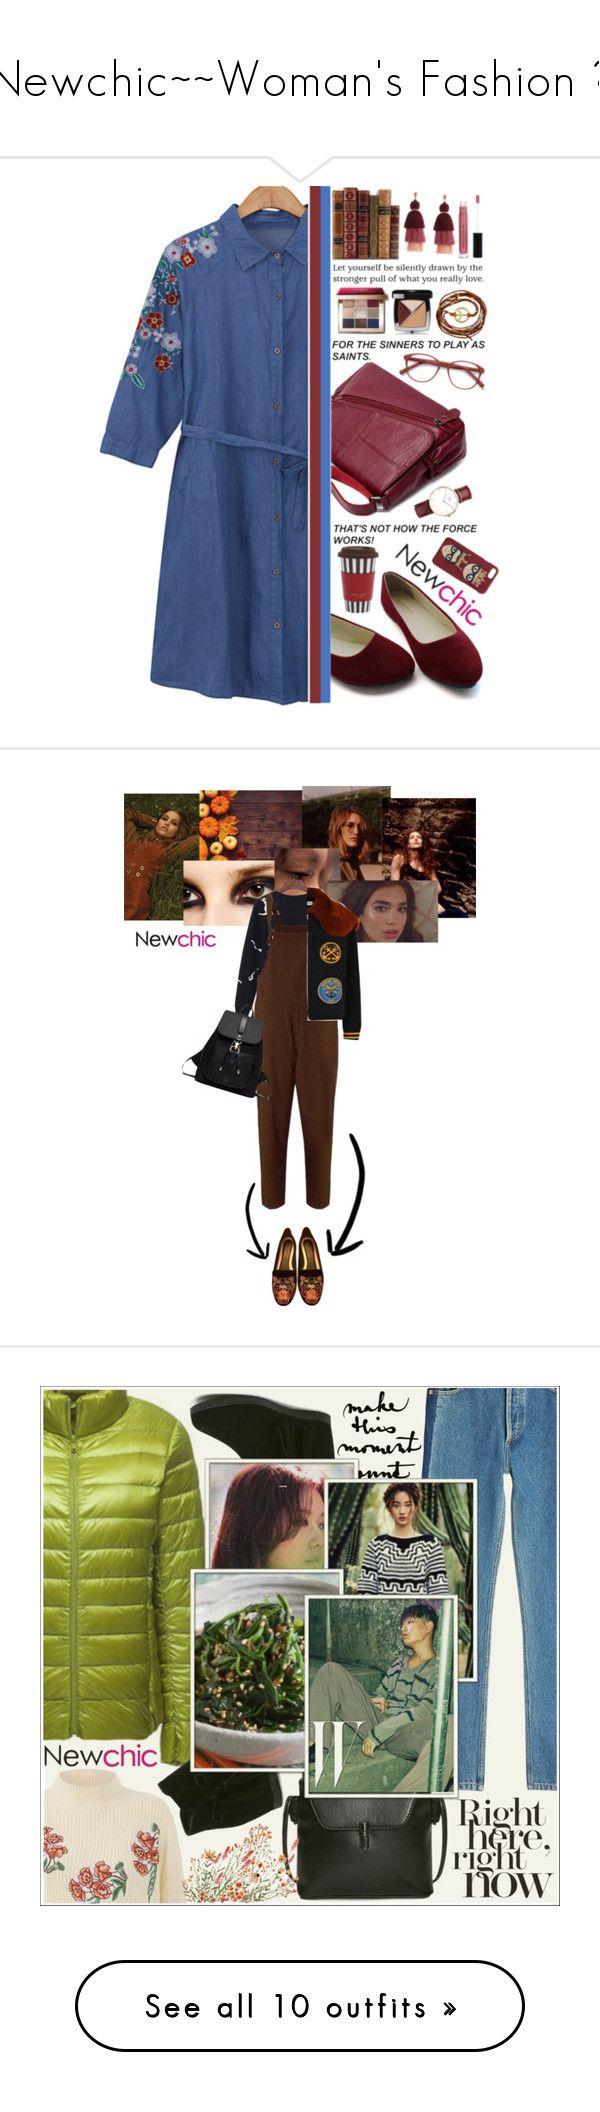 """Newchic~~Woman's Fashion ♥"" by av-anul ❤ liked on Polyvore featuring EyeBuyDirect.com, Bobbi Brown Cosmetics, Chanel, Daniel Wellington, Ettika, Anastasia Beverly Hills, Henri Bendel, Dolce&Gabbana, Balmain and Coach"